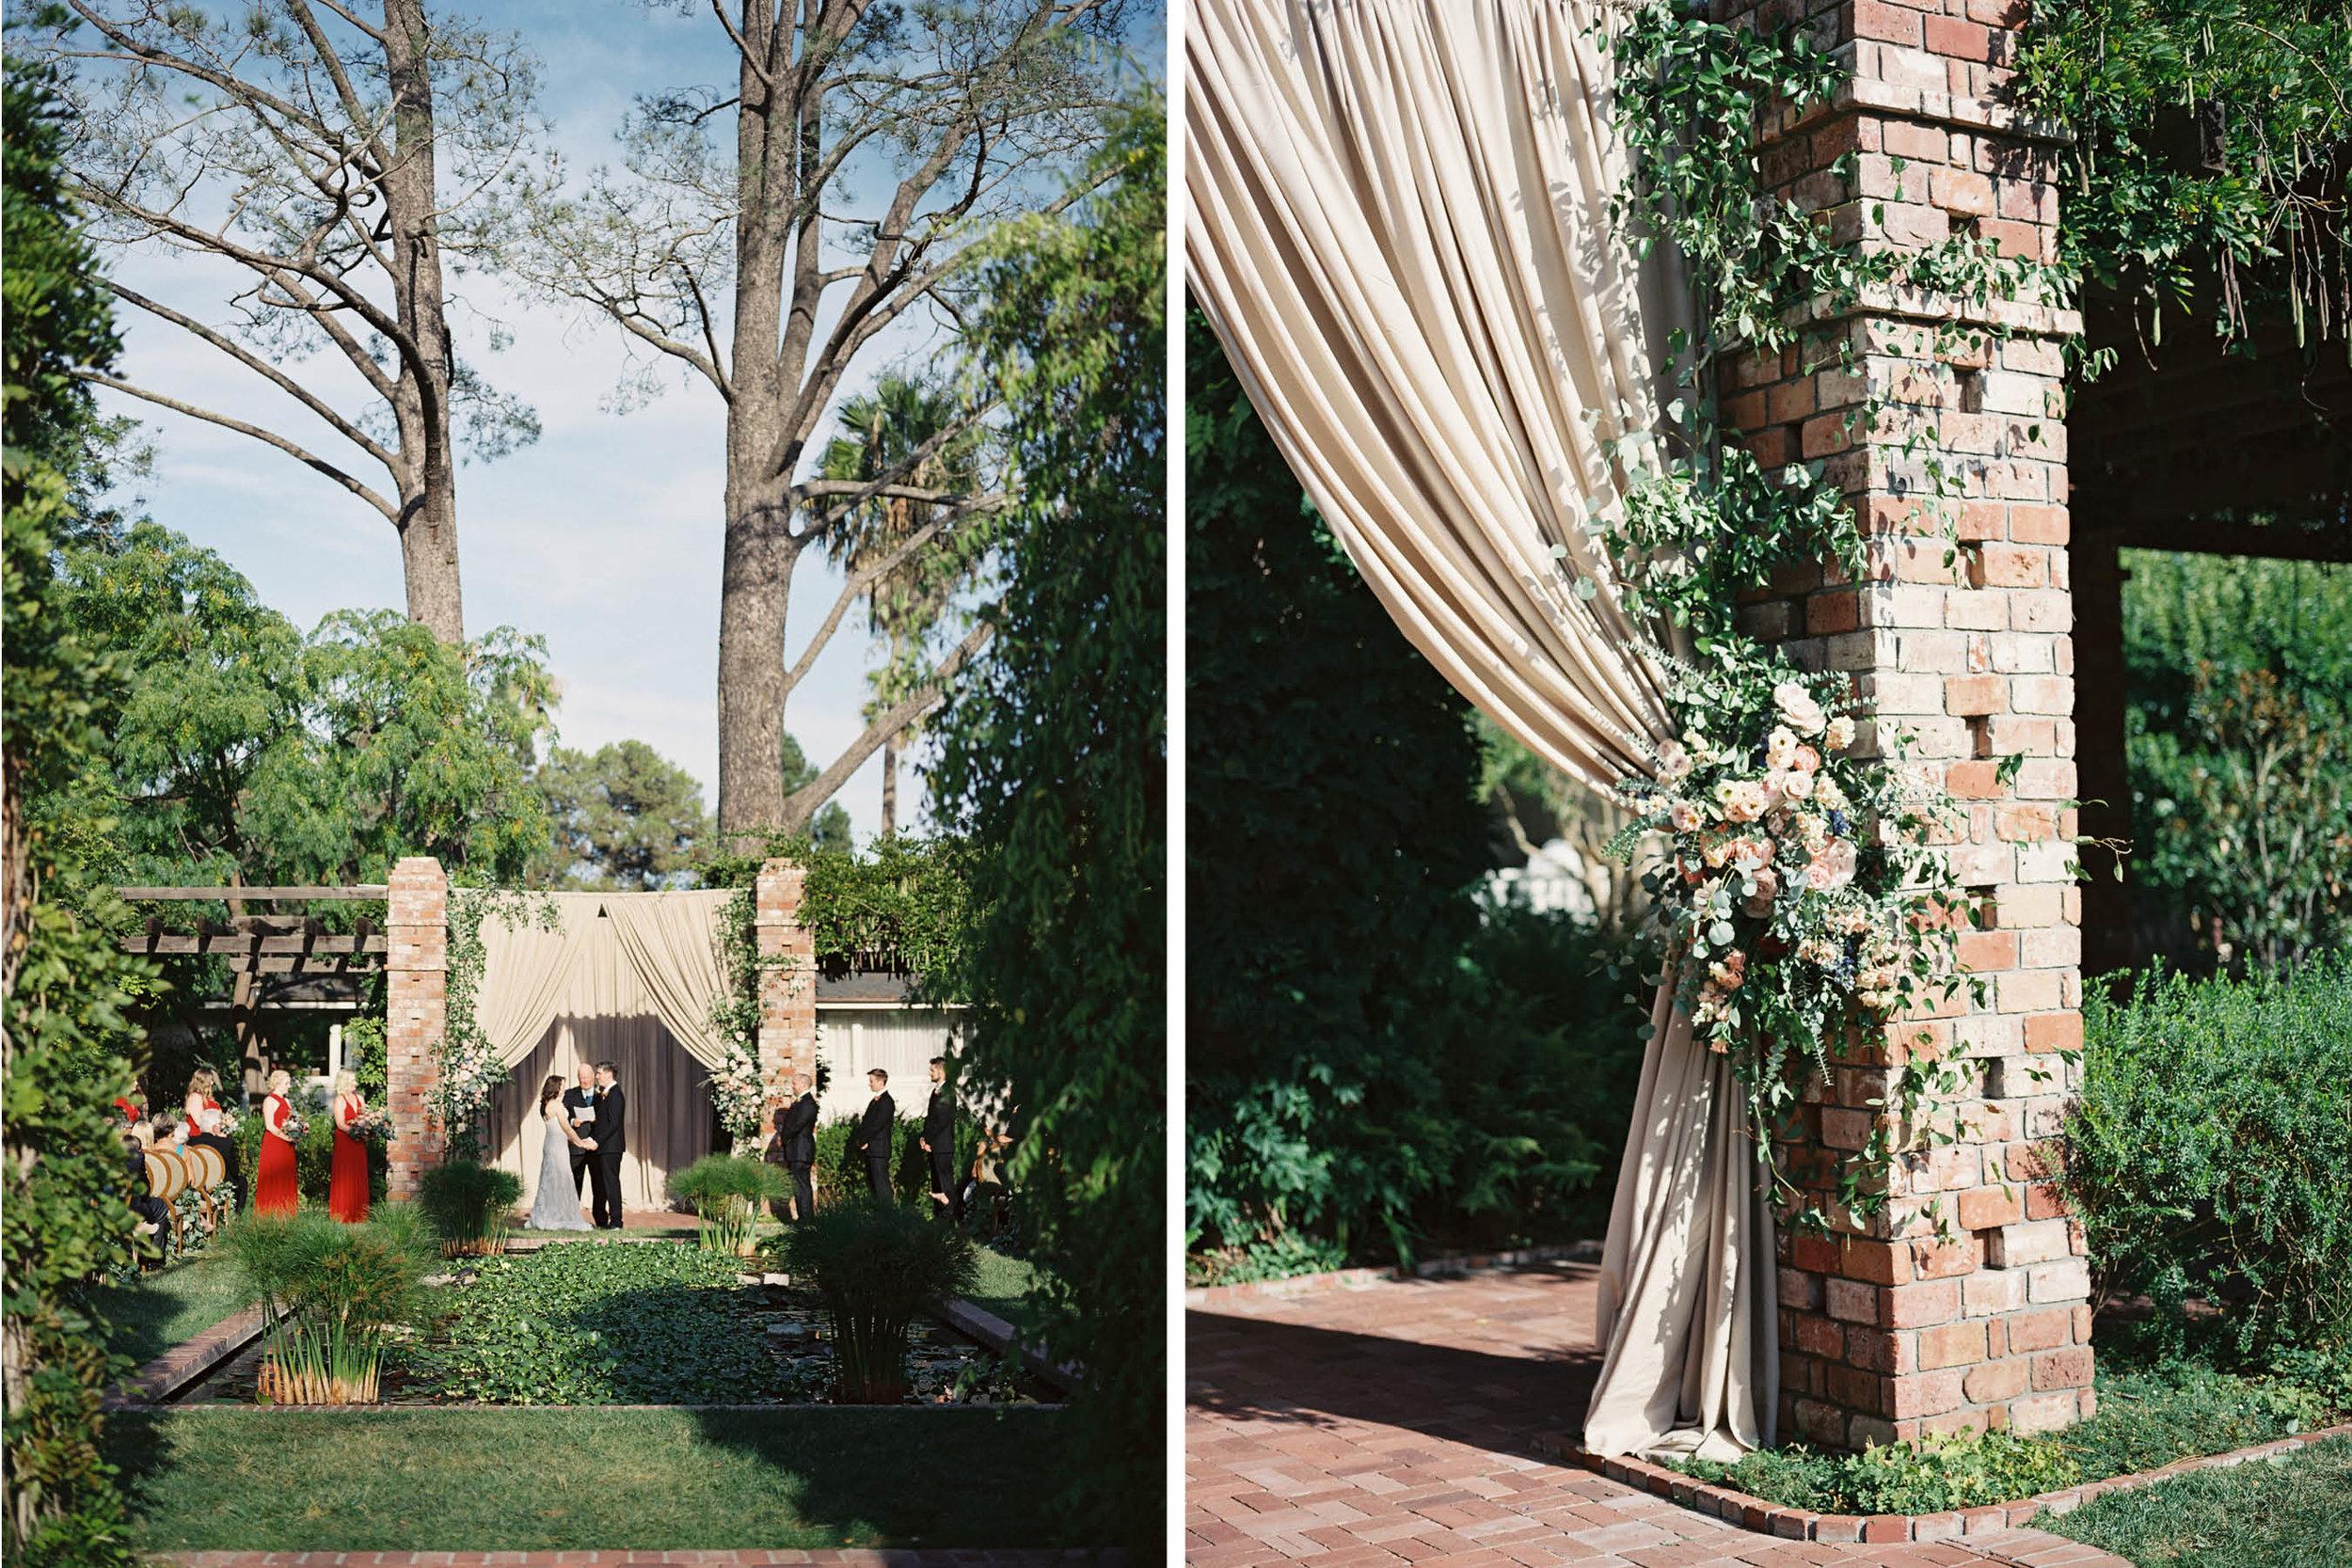 alegria-by-design-wedding-planner-planning-coordination-day-of-event-design-el-encanto-resort-riviera-garden-lily-pond-outdoor-red-navy (8).jpg